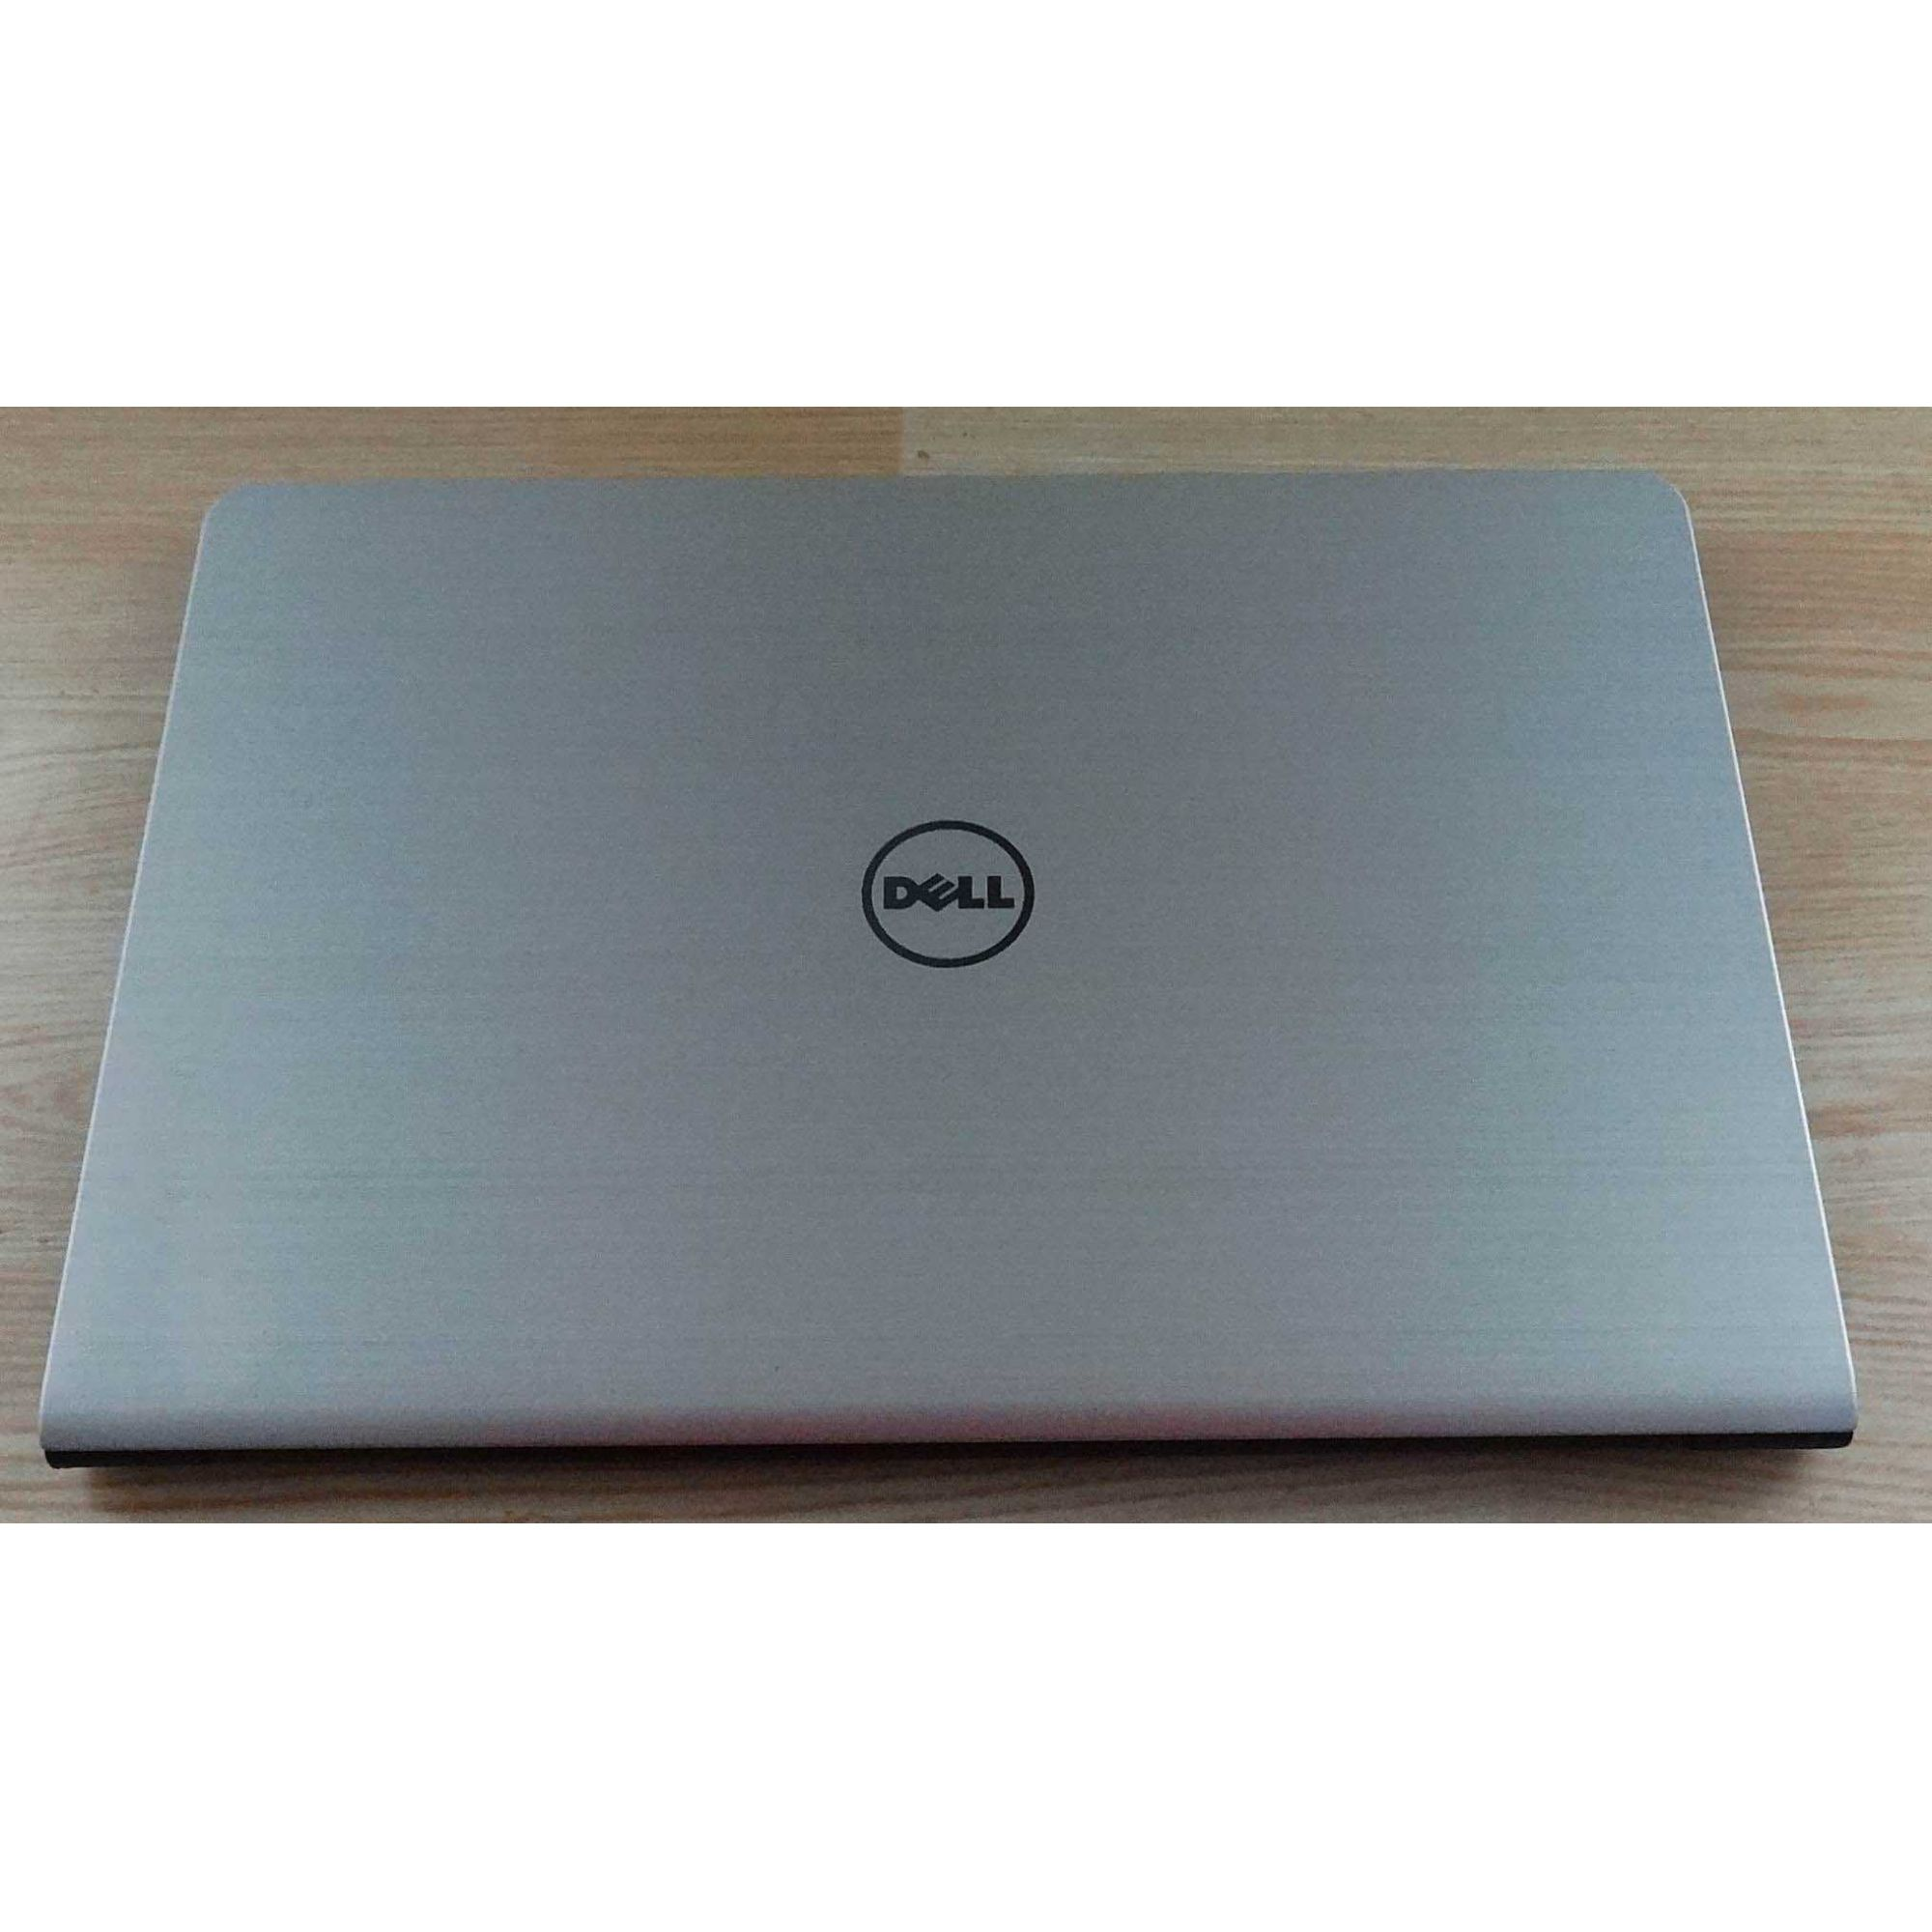 "Notebook Dell Inspiron 5547 15.6"" Intel Core i7  2.00GHz 8GB 240GB (SSD) (2GB DEDICADA) + Touch + Alphanumérico"